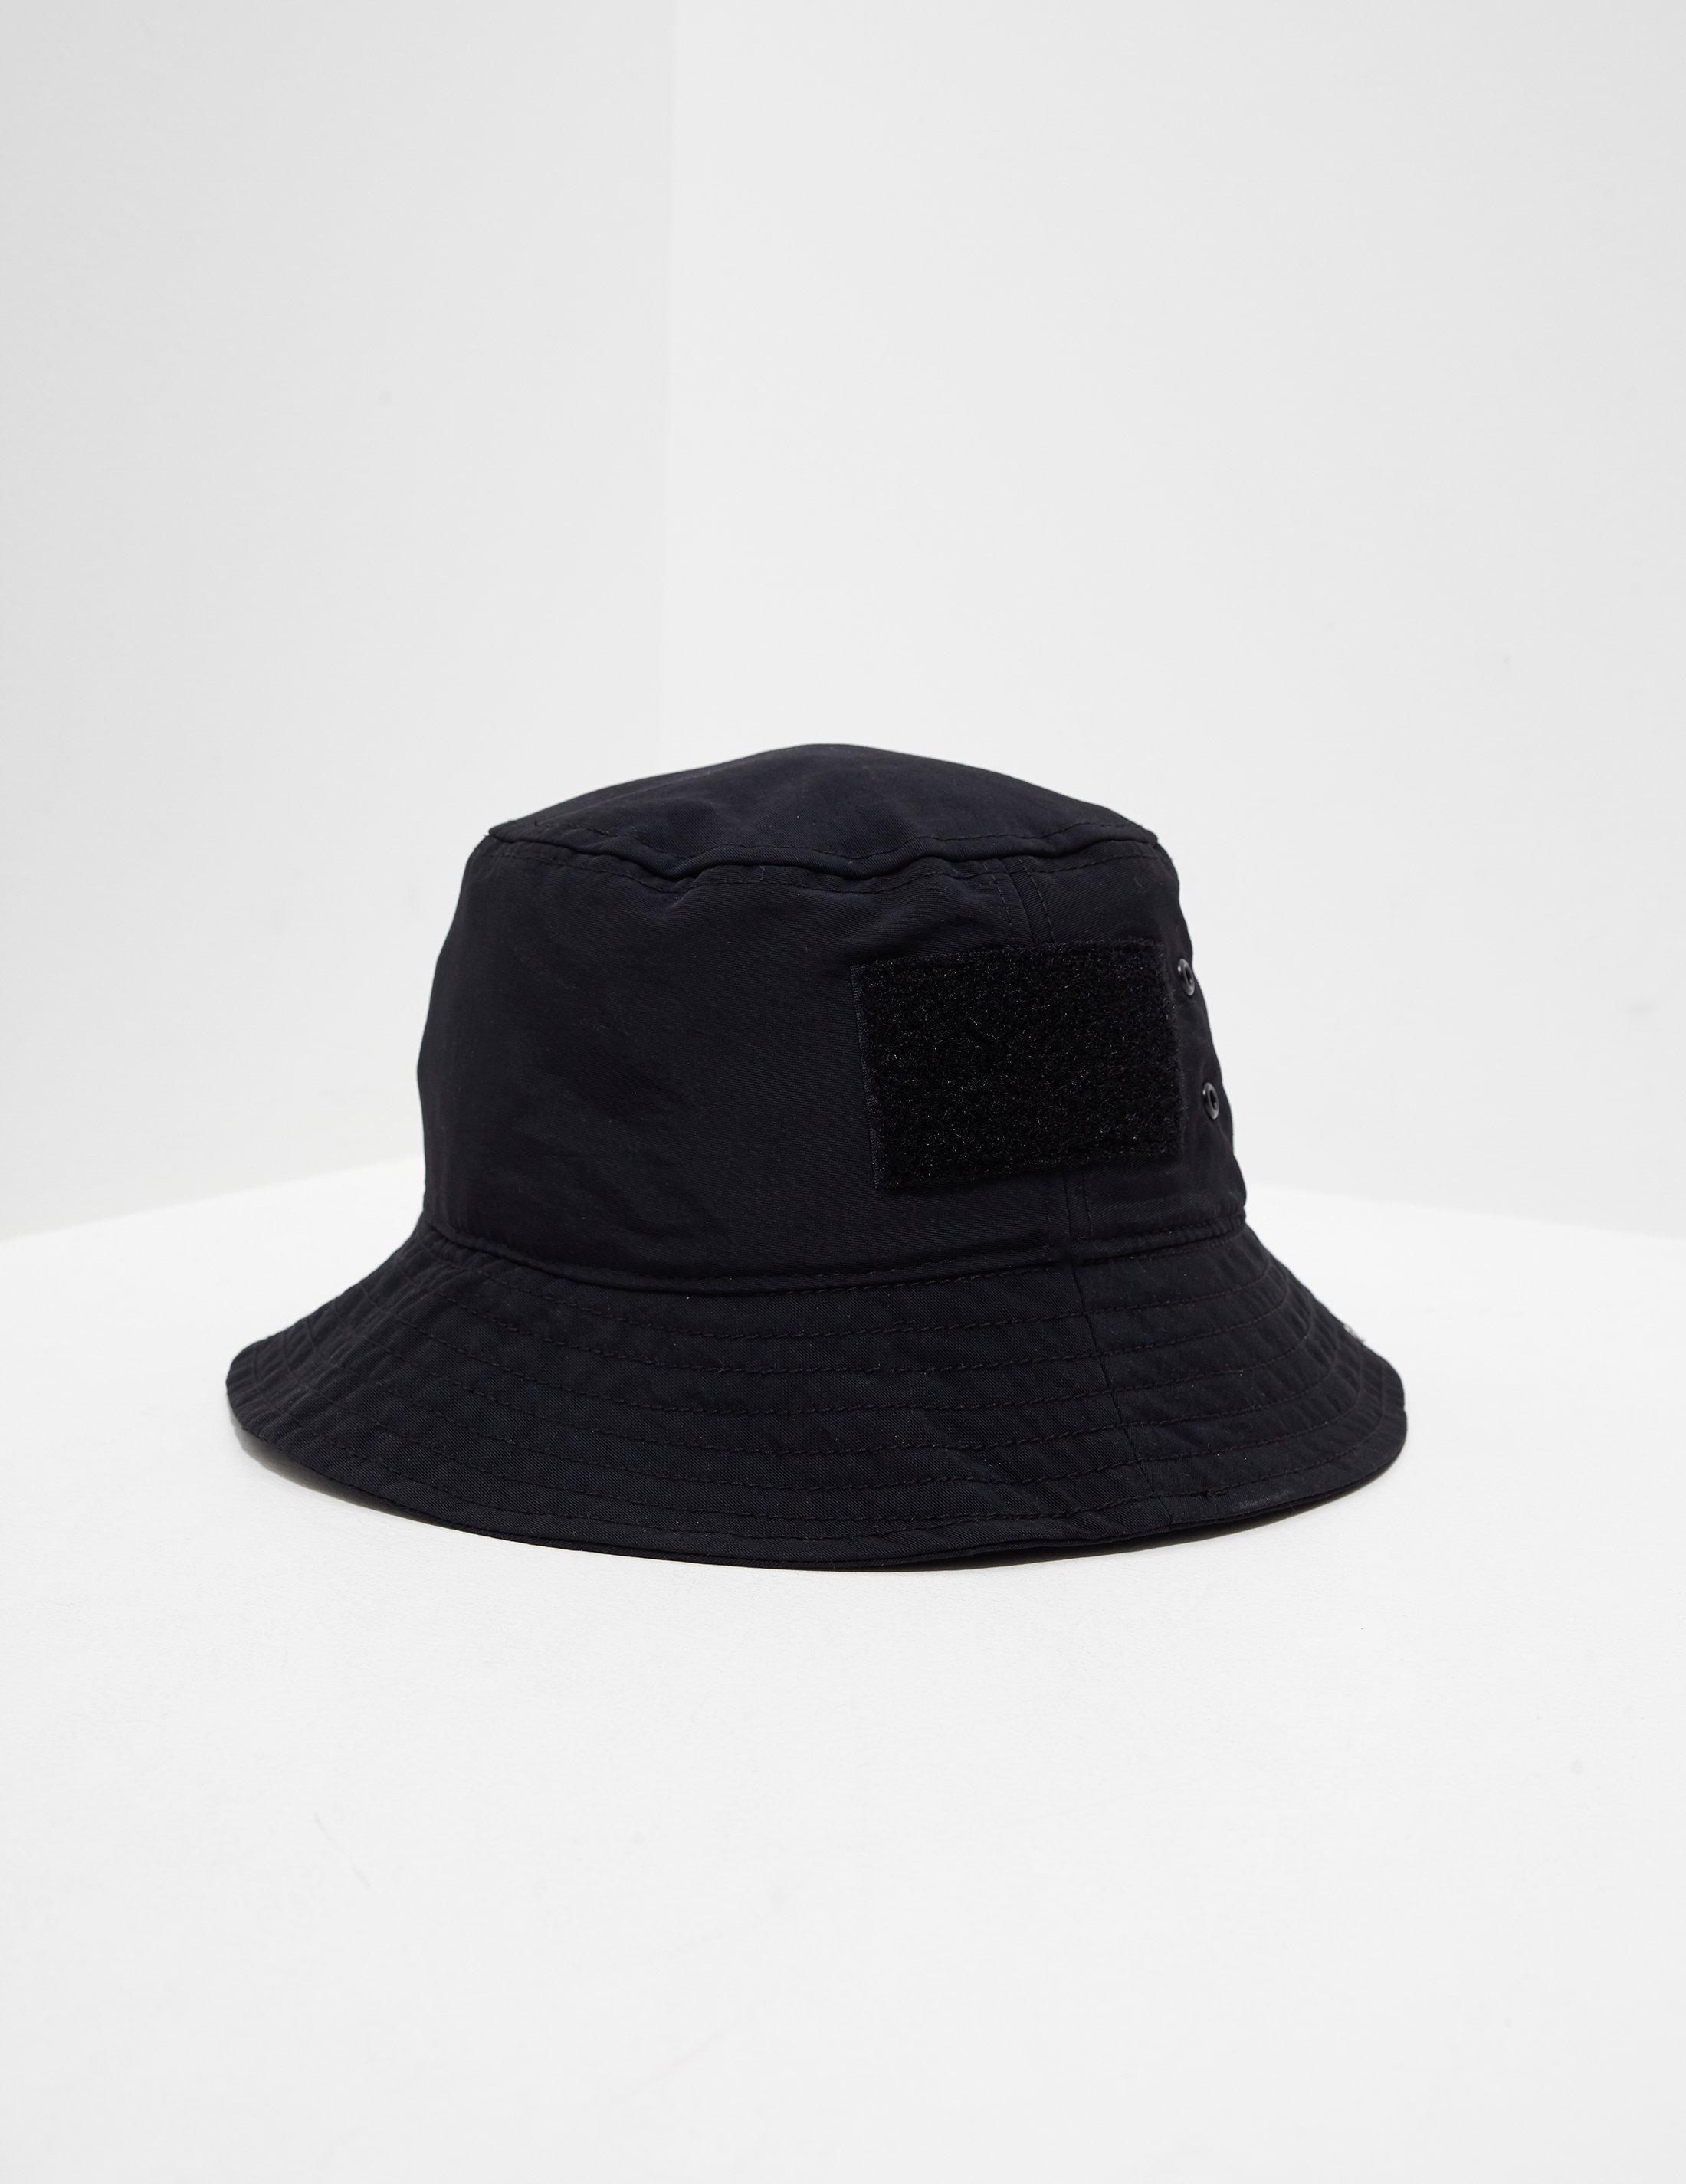 a26331257 BOSS Mens Bucket Hat Black/black for men